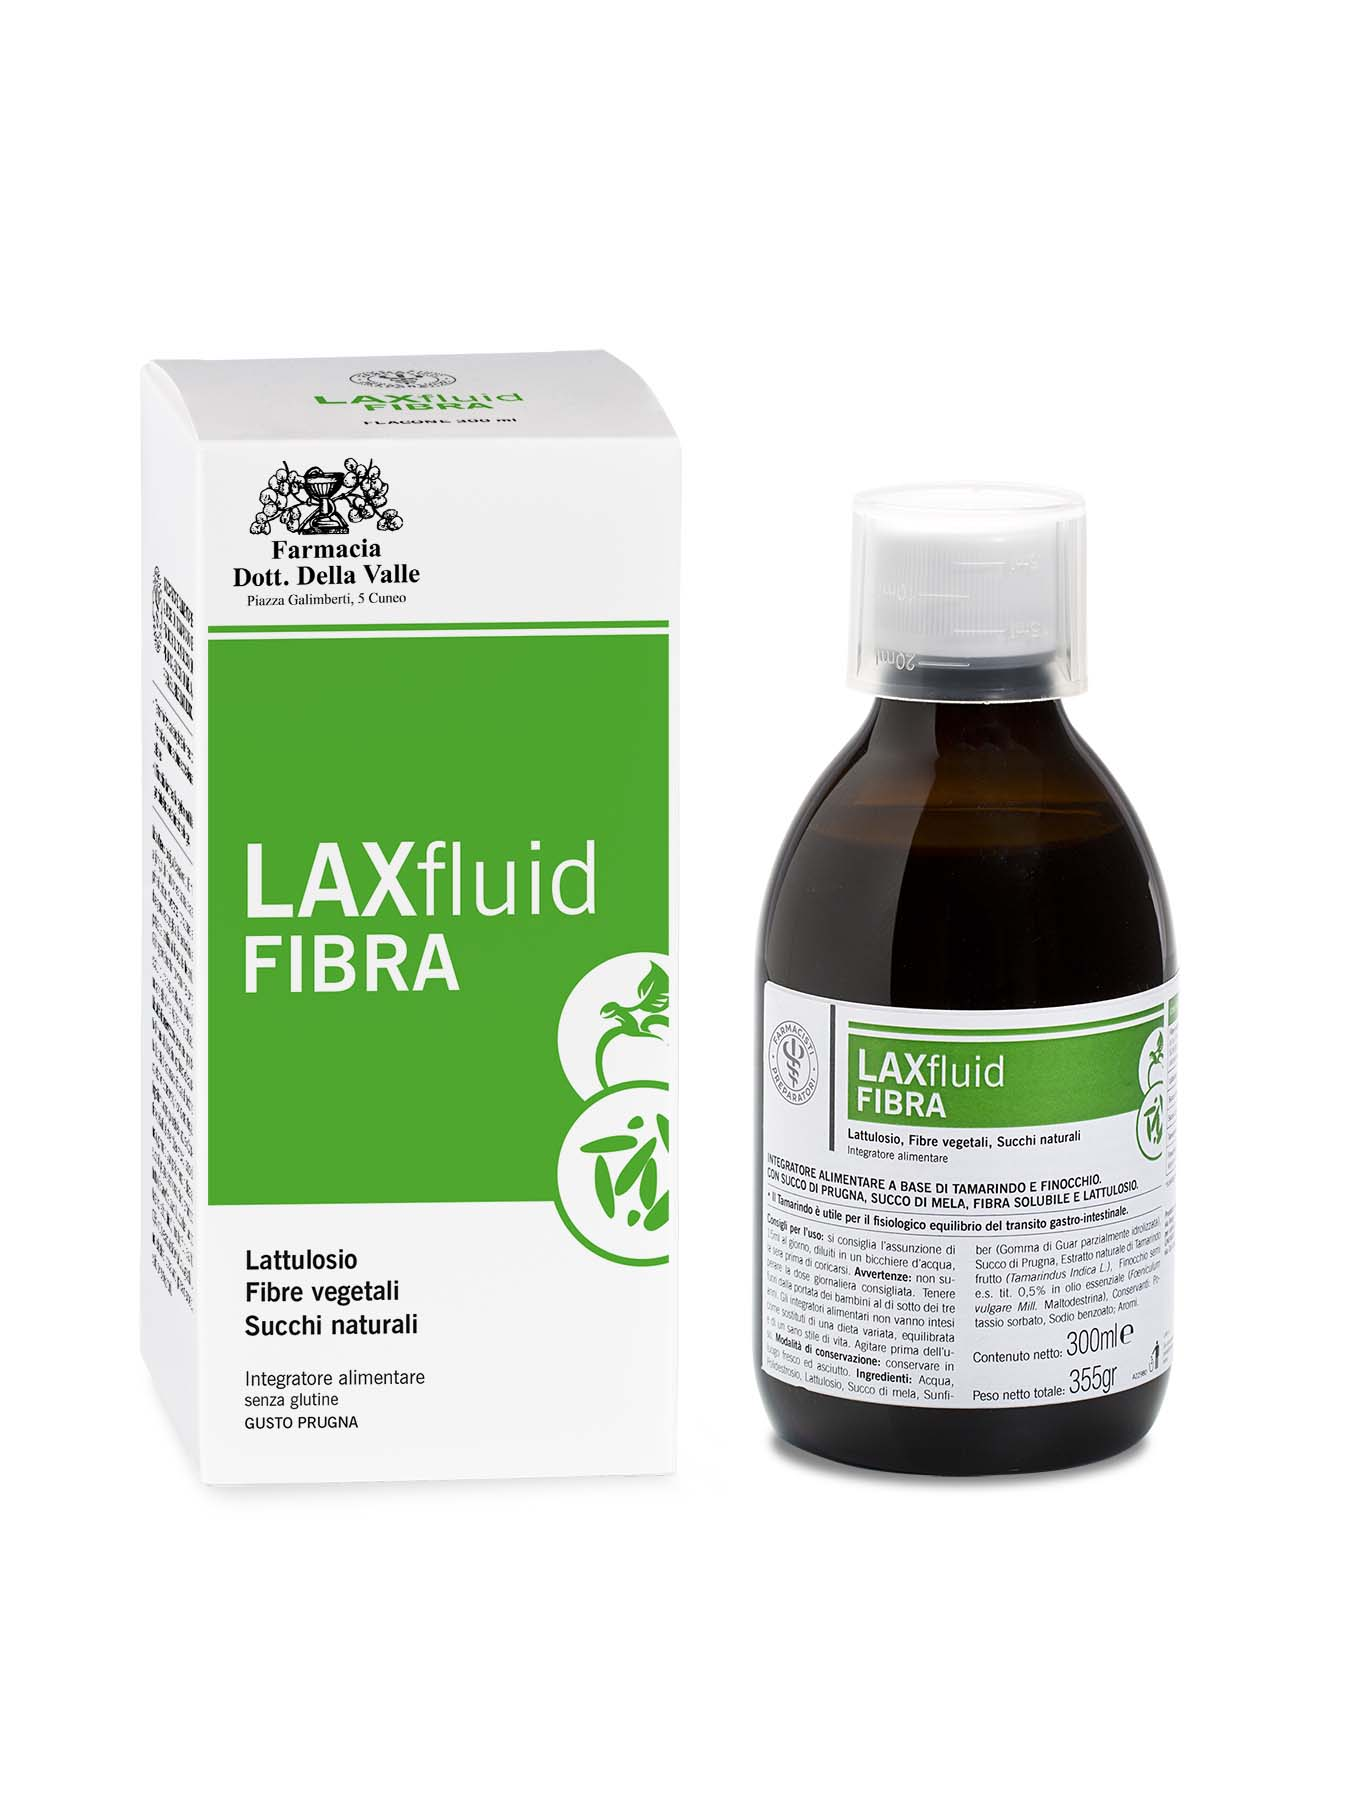 LFP LAXFLUID FIBRA